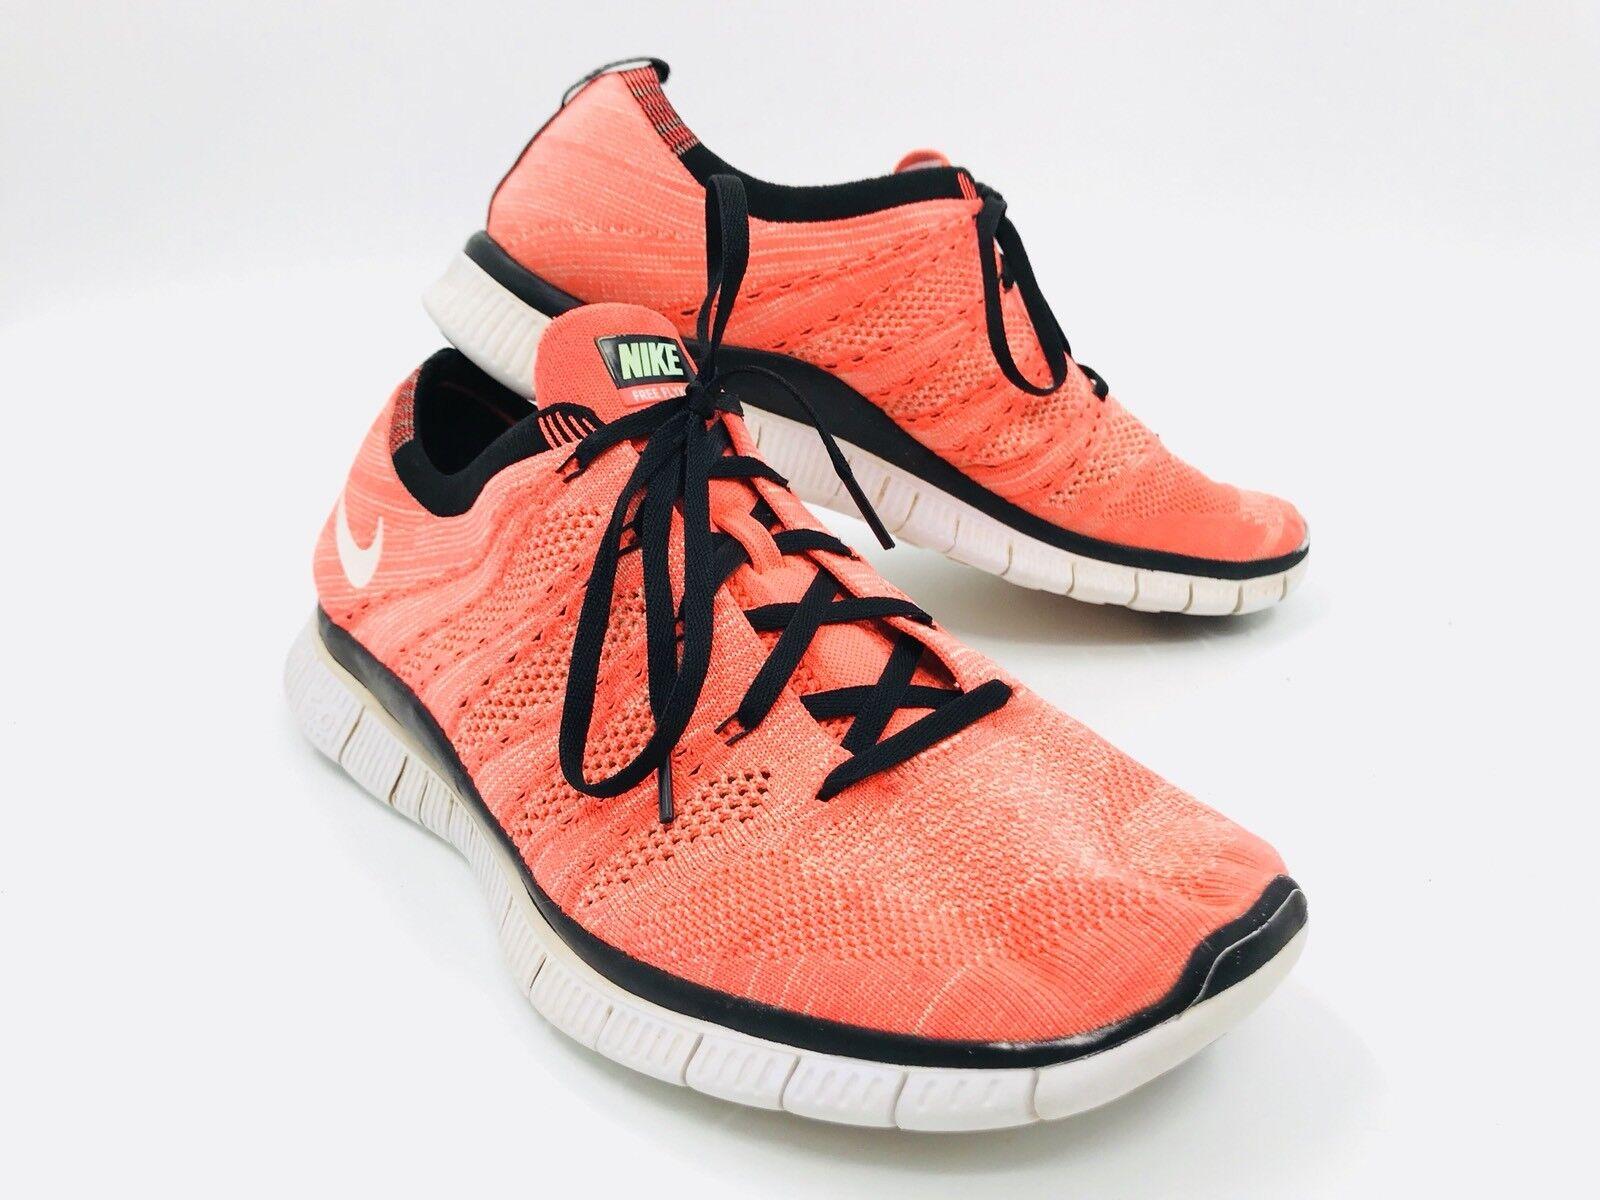 Nike Free Flyknit NSW Hot Lava Orange Mens Running Shoes Comfortable